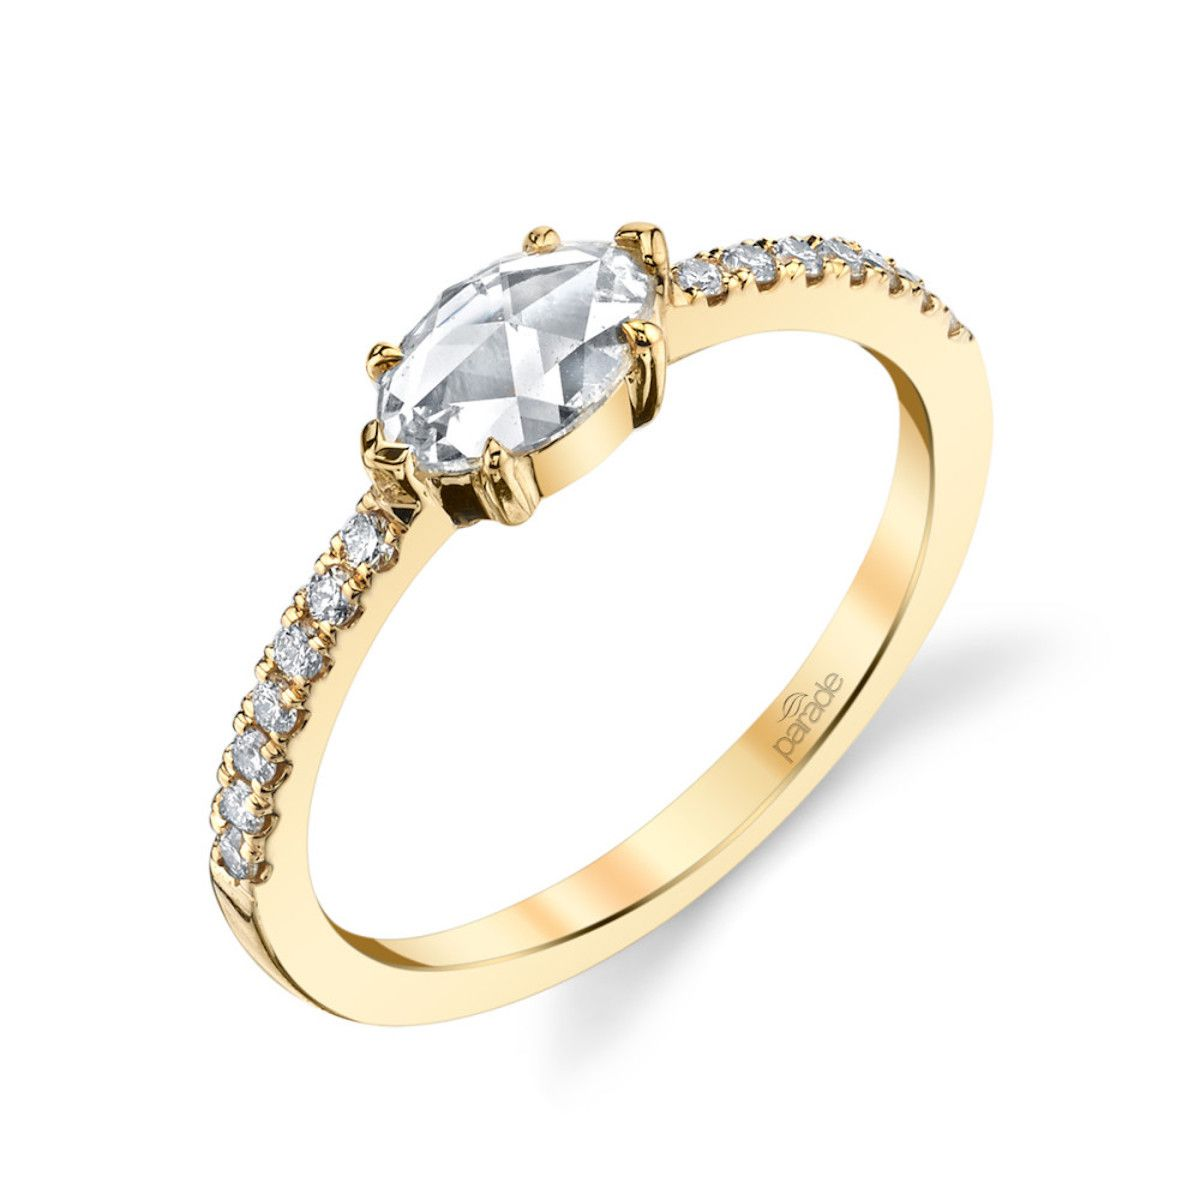 Parade Design Lumiere Bridal Ring